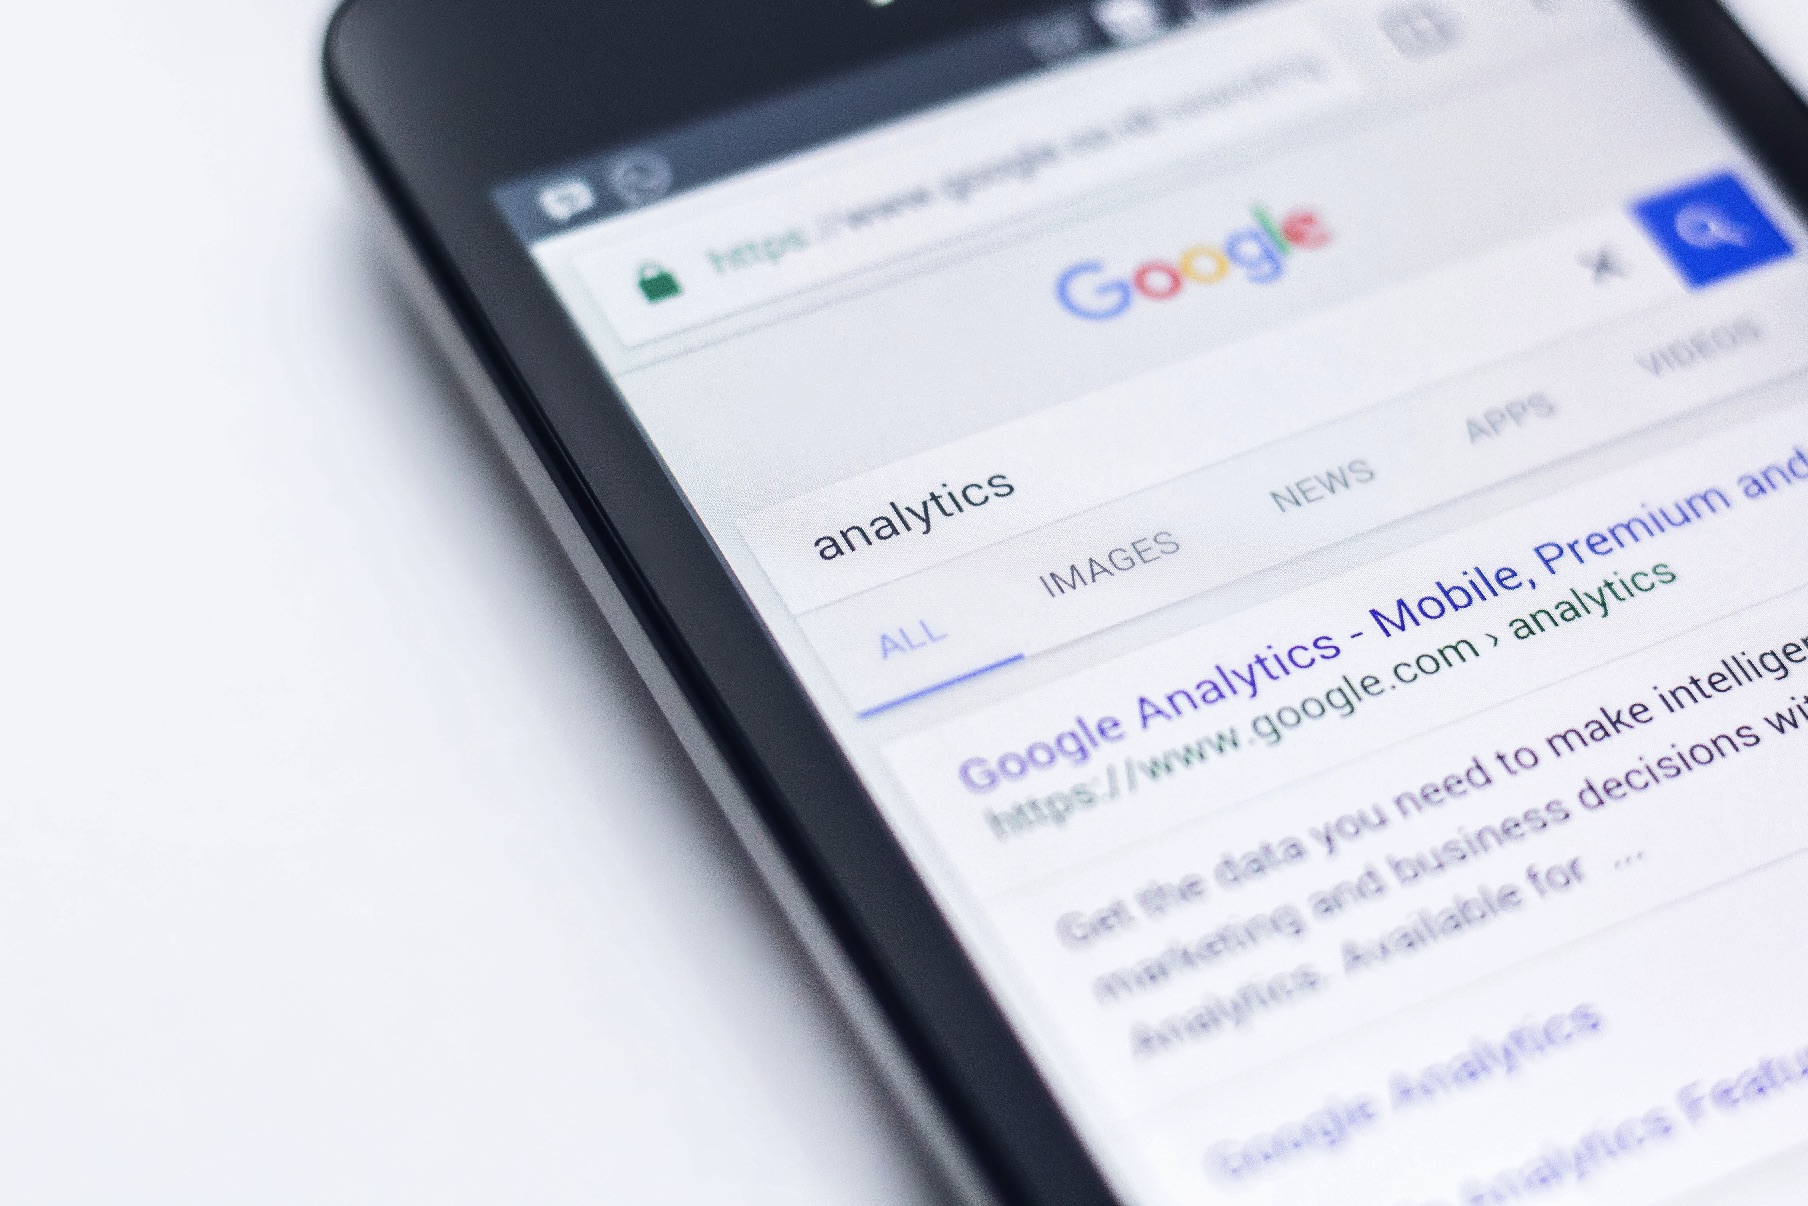 Google's mobile popup algorithm impact on web development